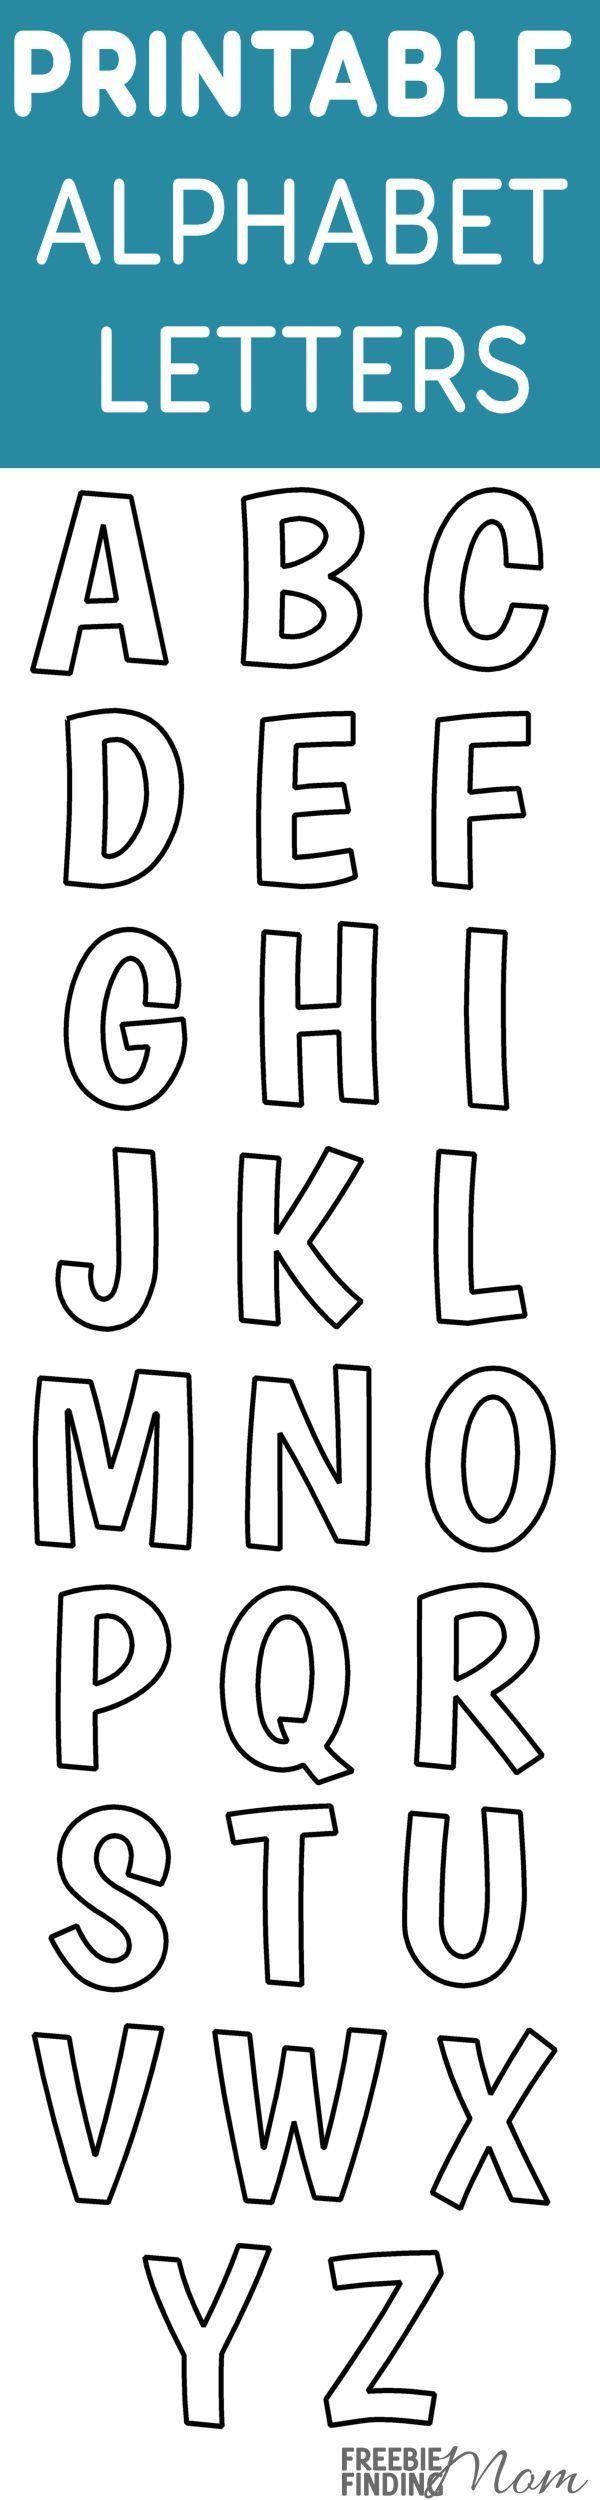 Printable FREE Alphabet Templates   Printables, Teaching kids and ...